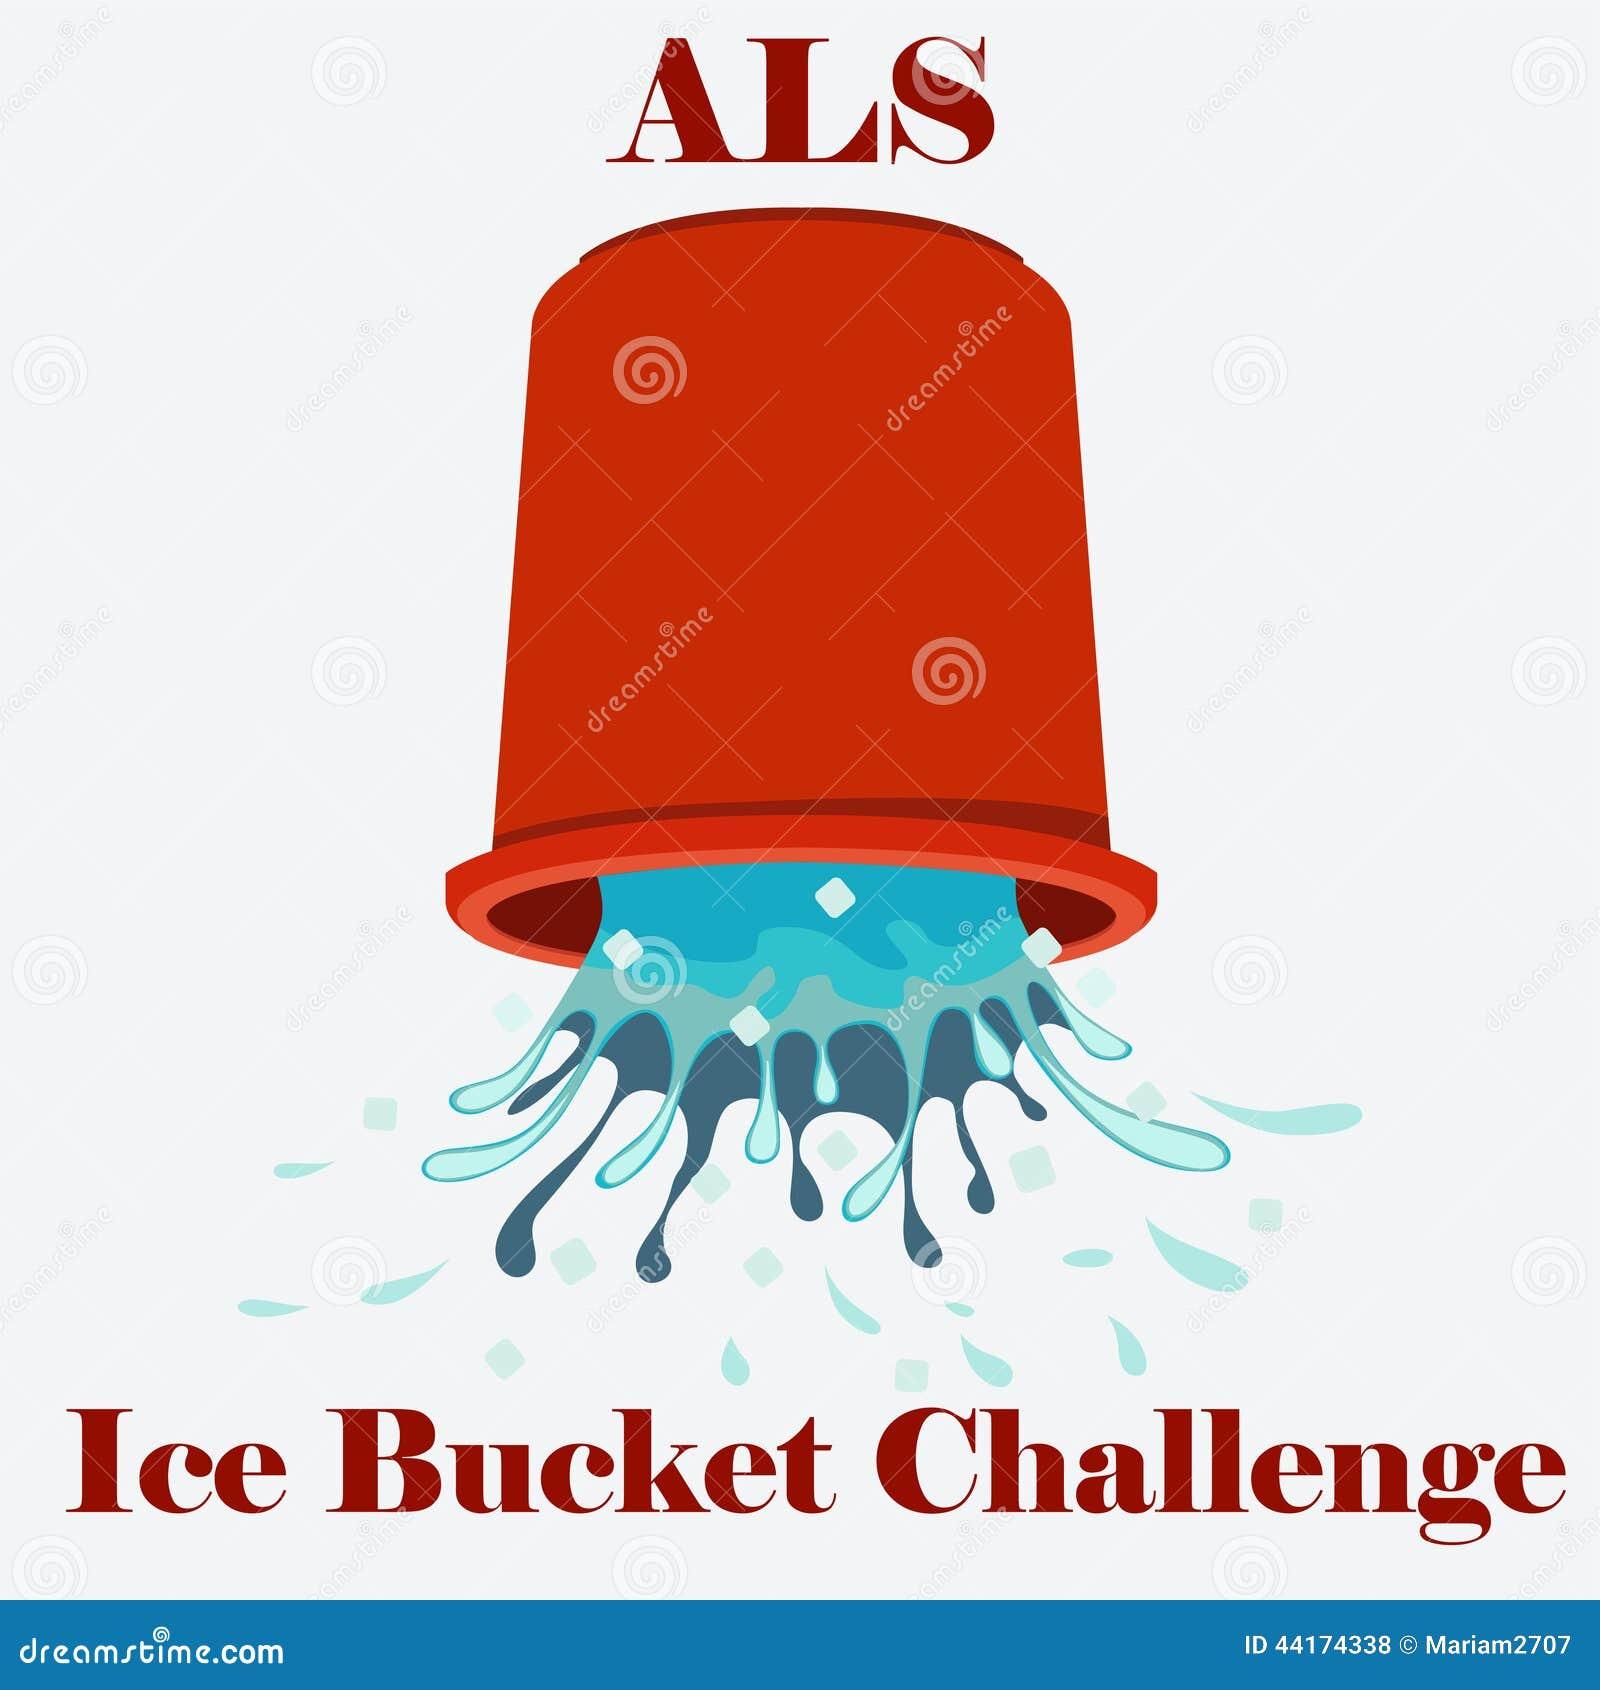 ALS冰桶挑战概念传染媒介